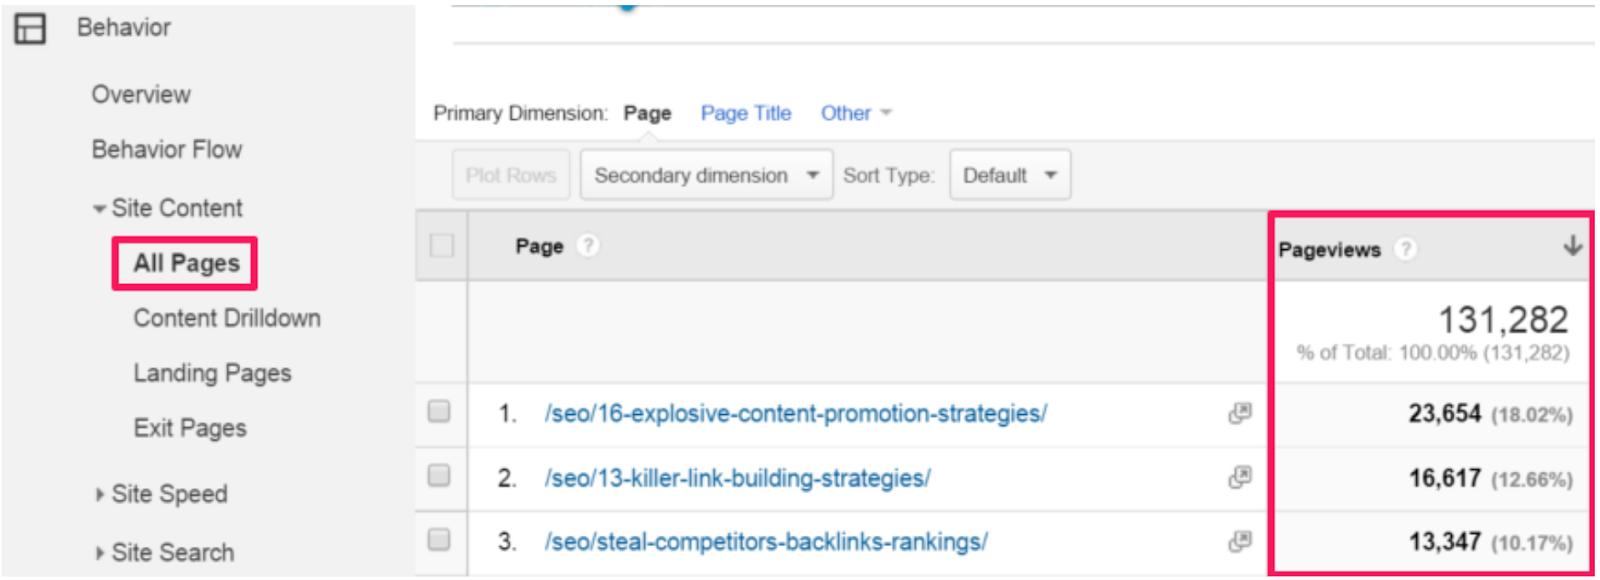 Screenshot showing Google Analytics stats